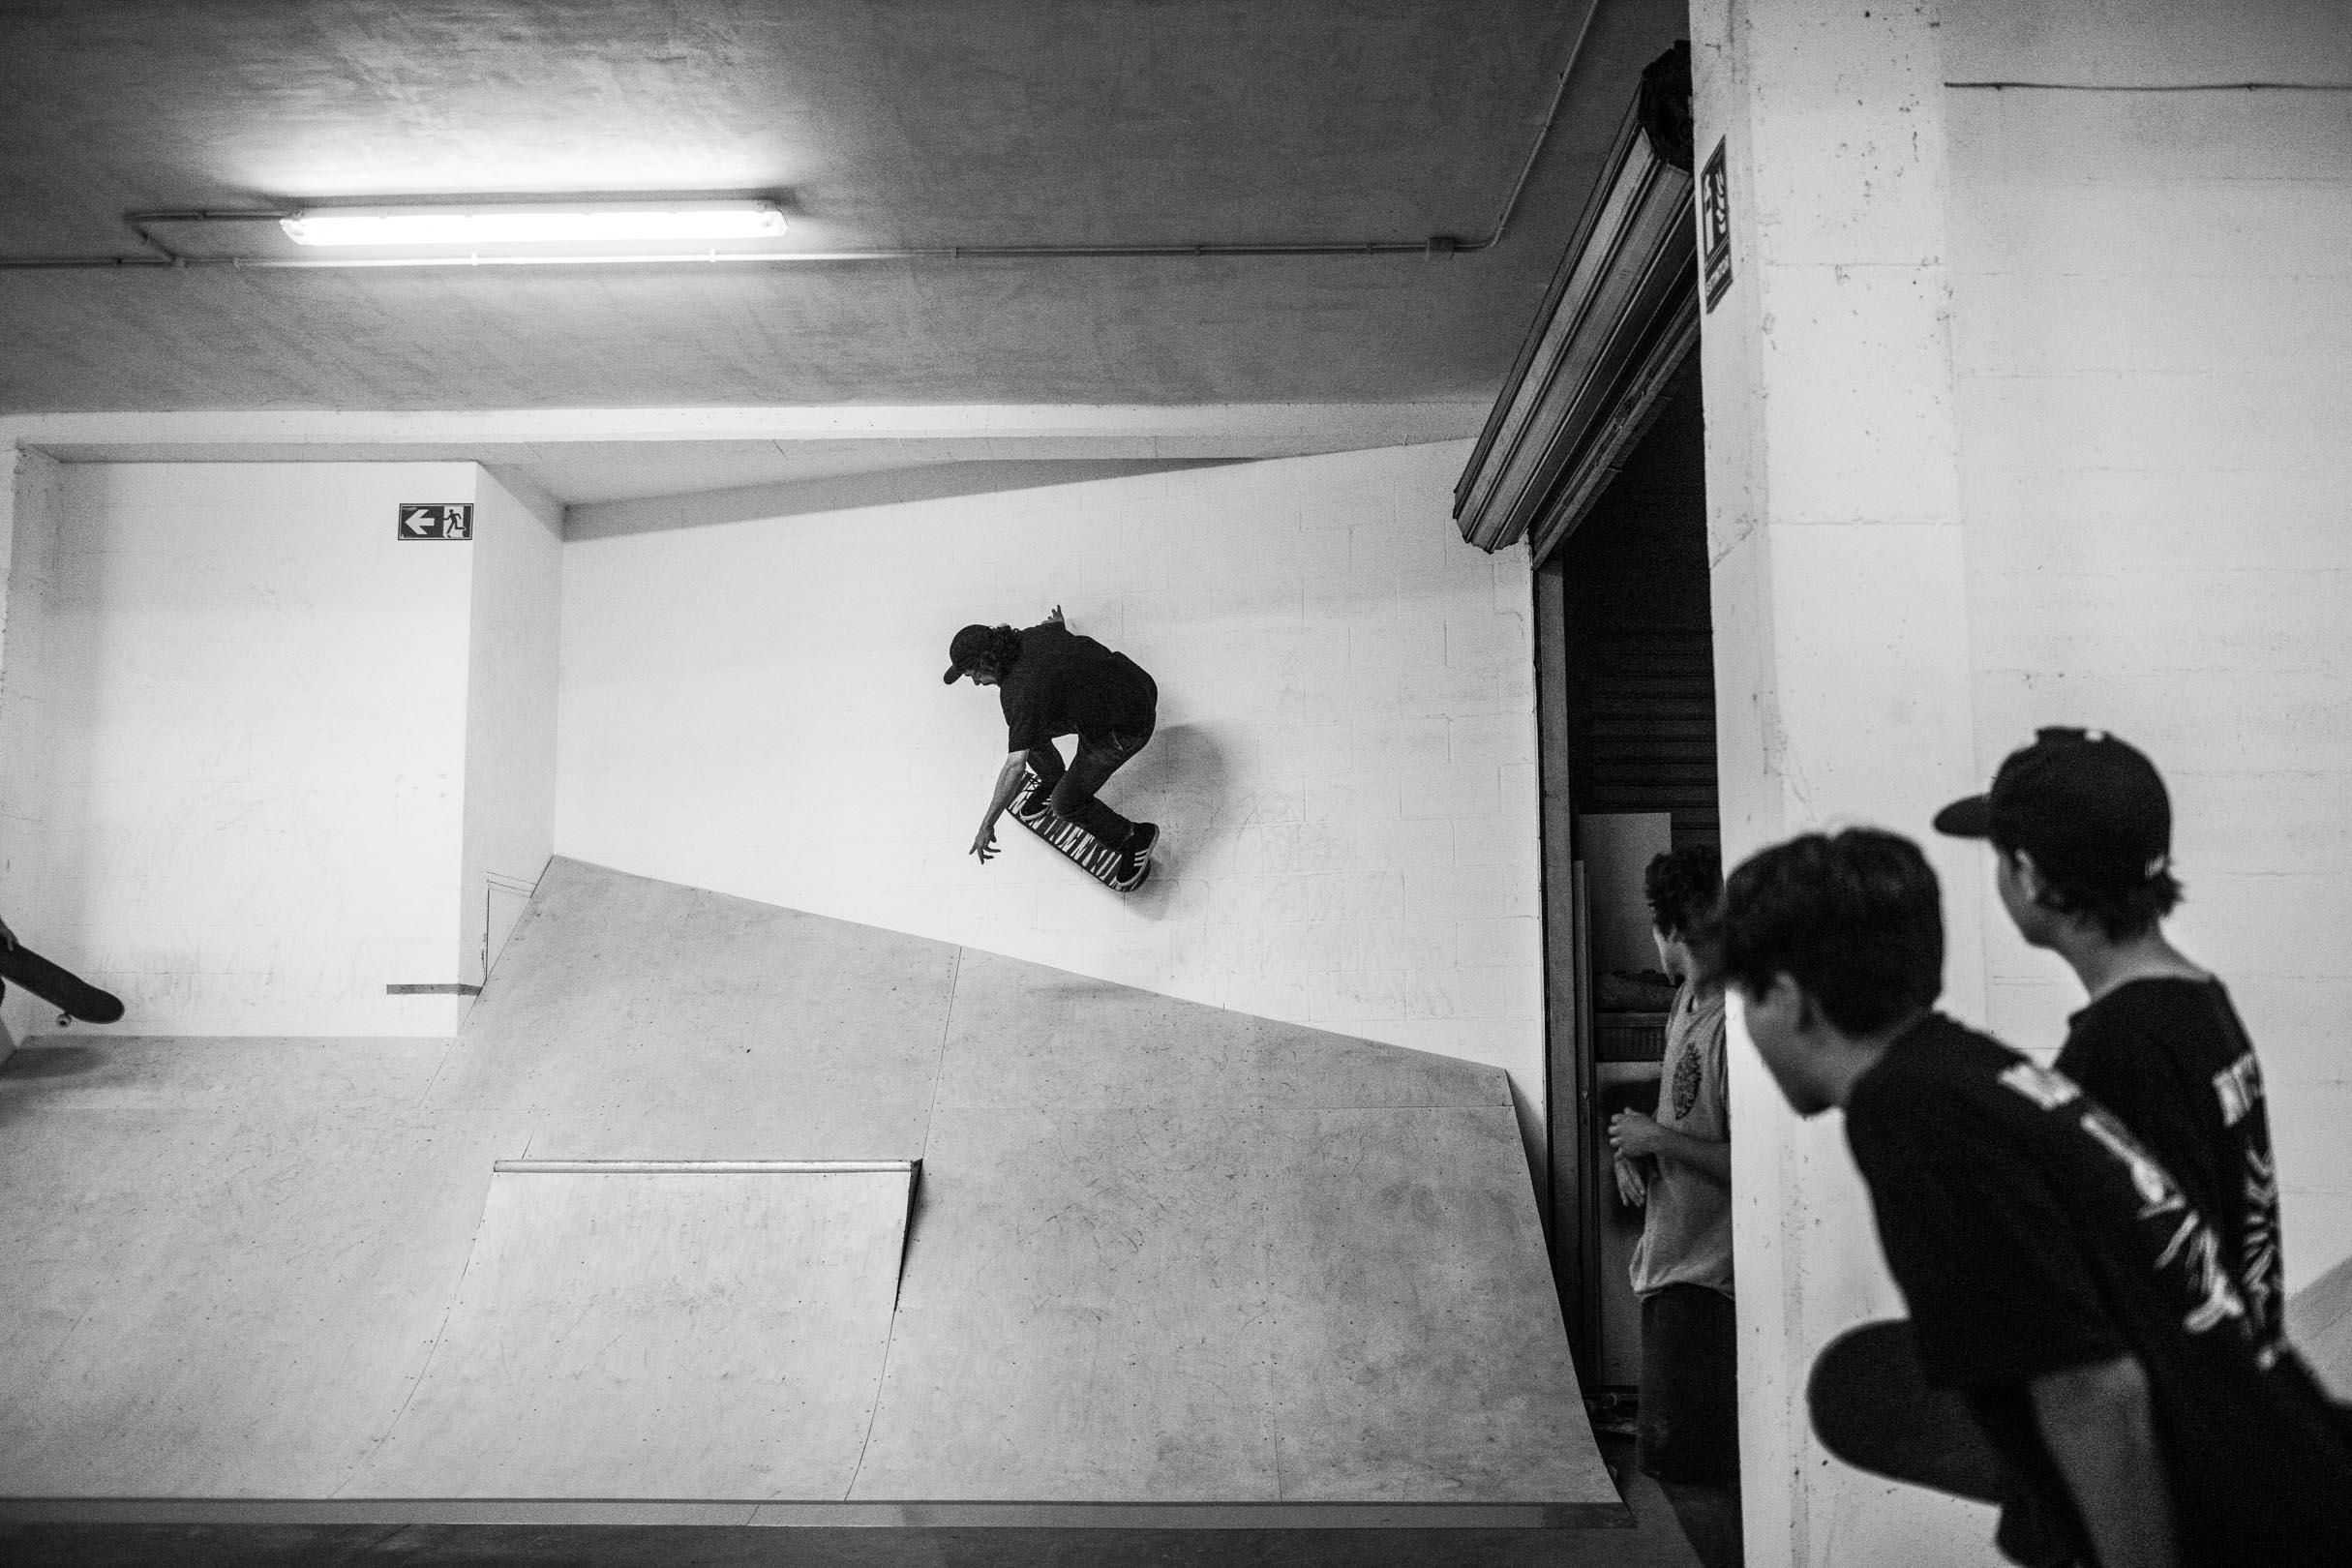 coruna-fotografia-skate-10.jpg